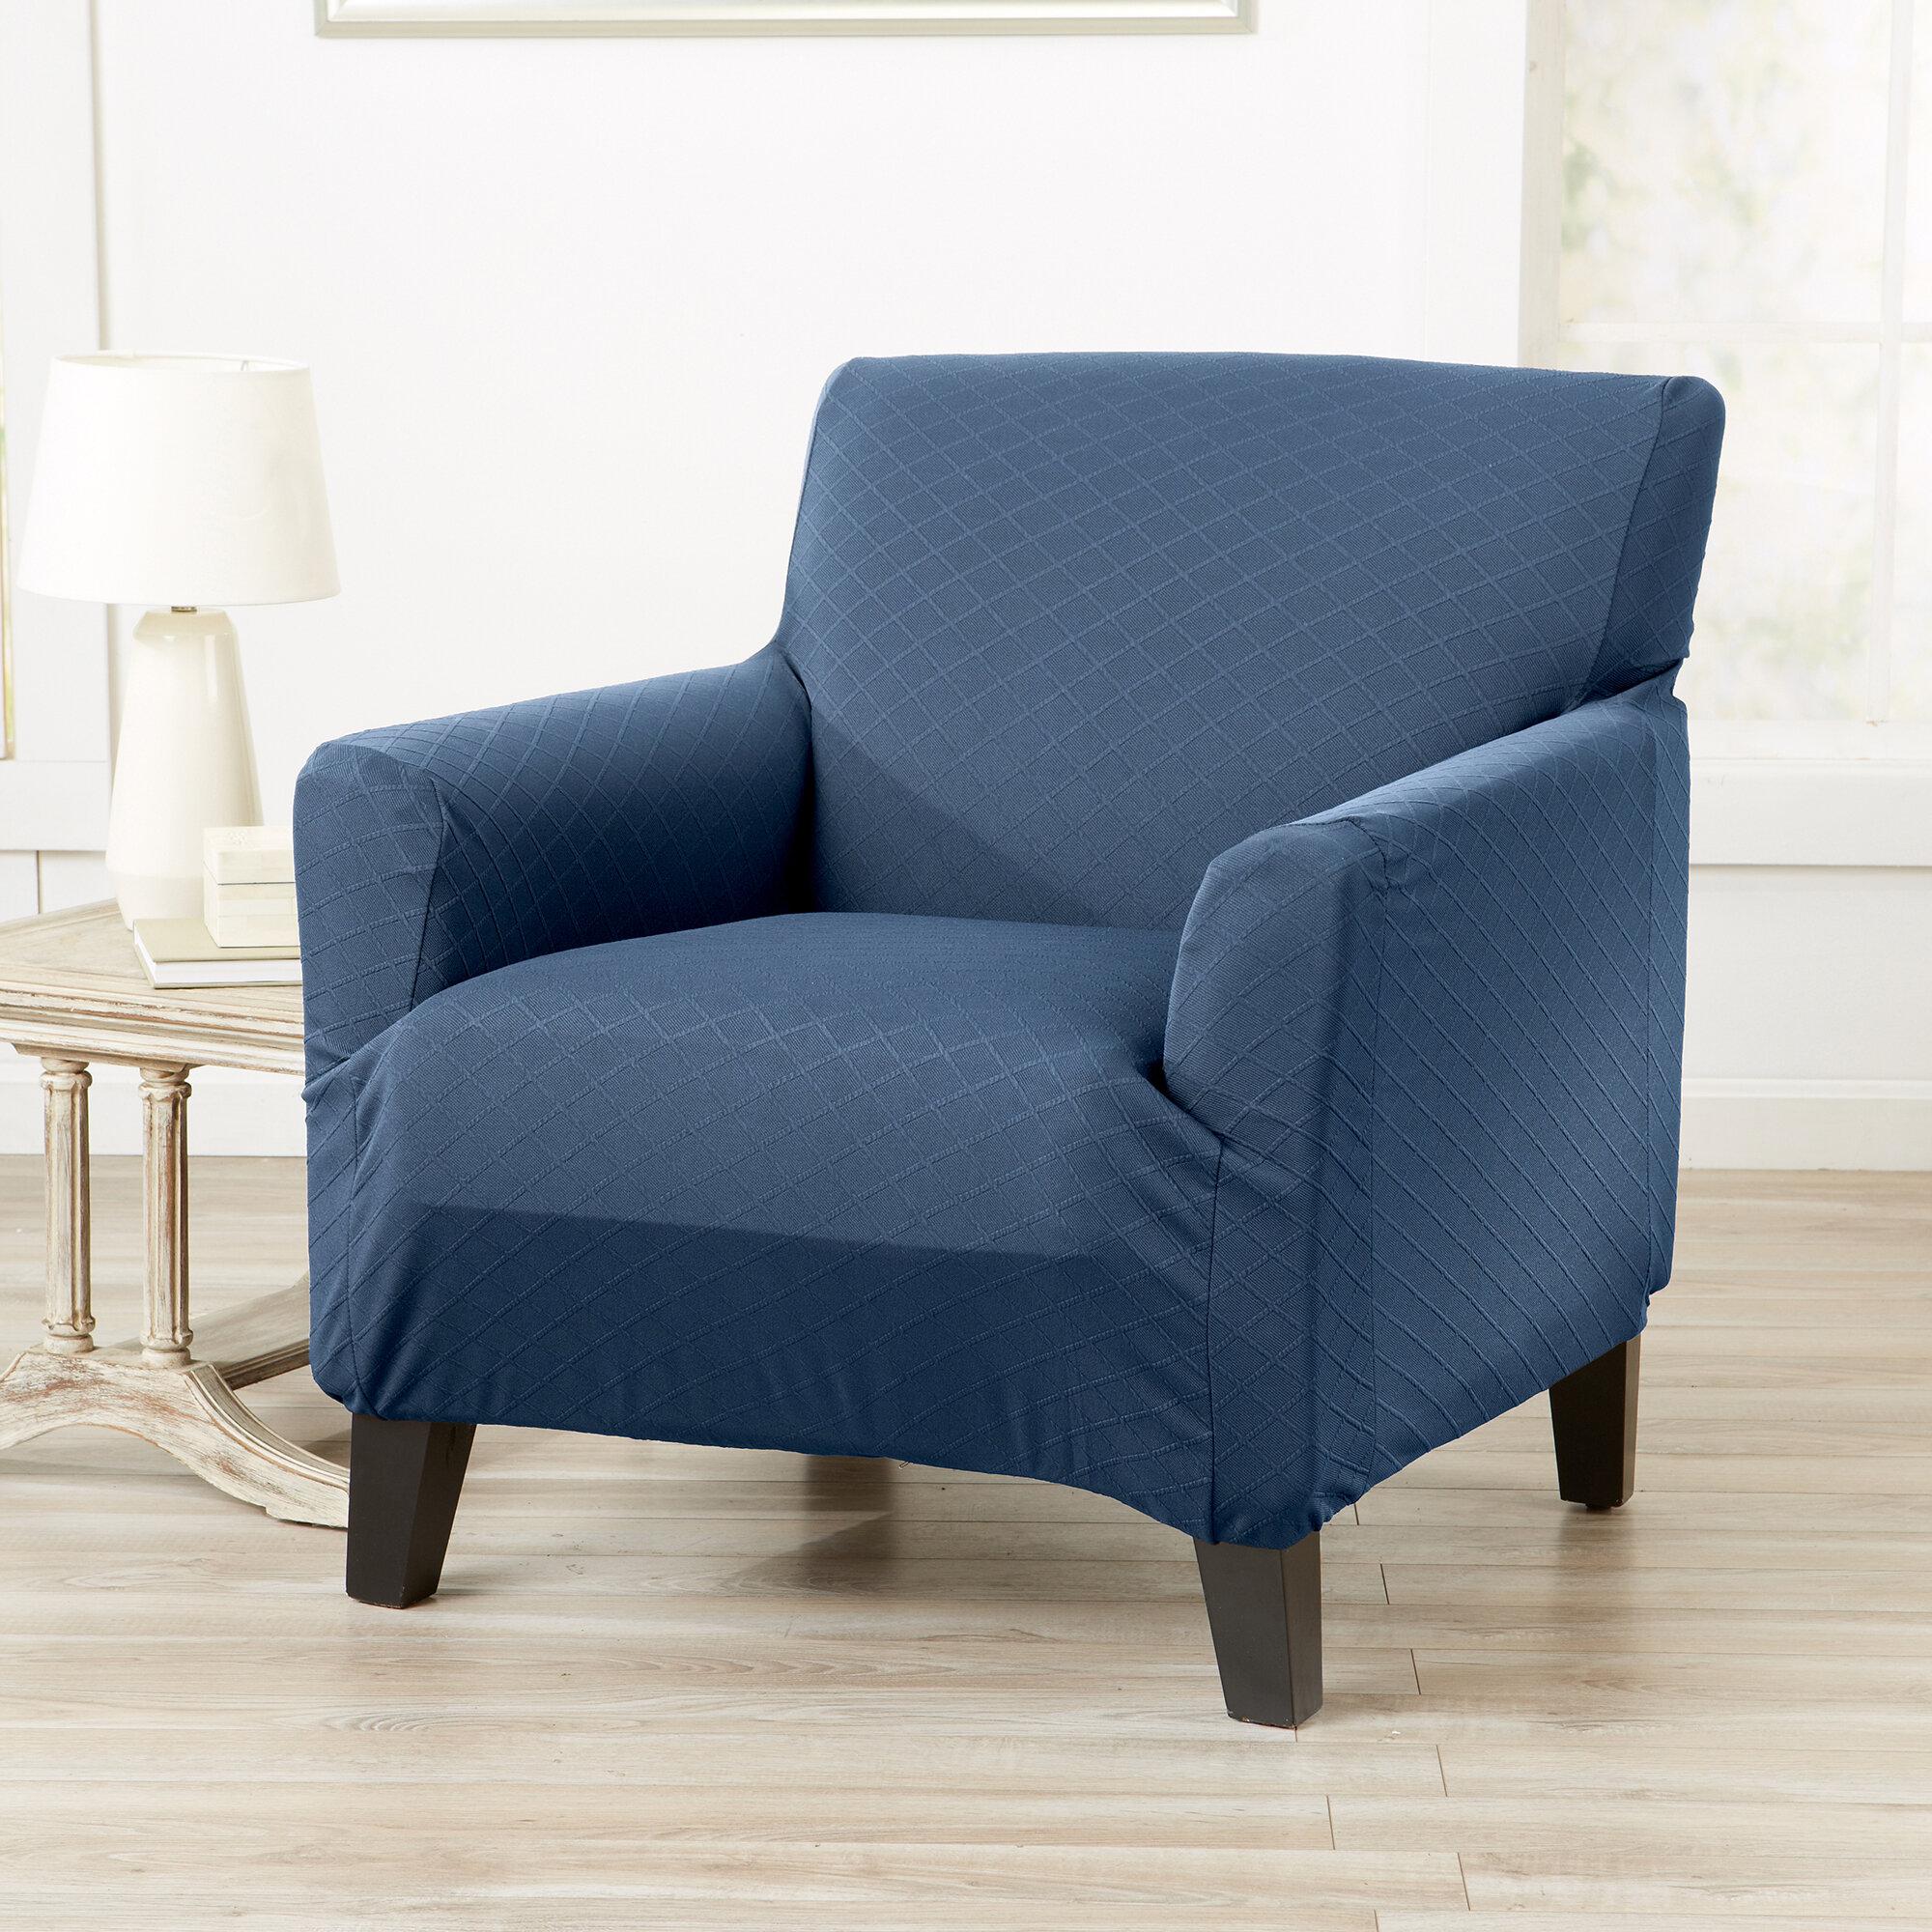 Box Shape Seat//Back Cover*Damask Chenille Chair 3D Cushion Case*Custom Size*Wk1